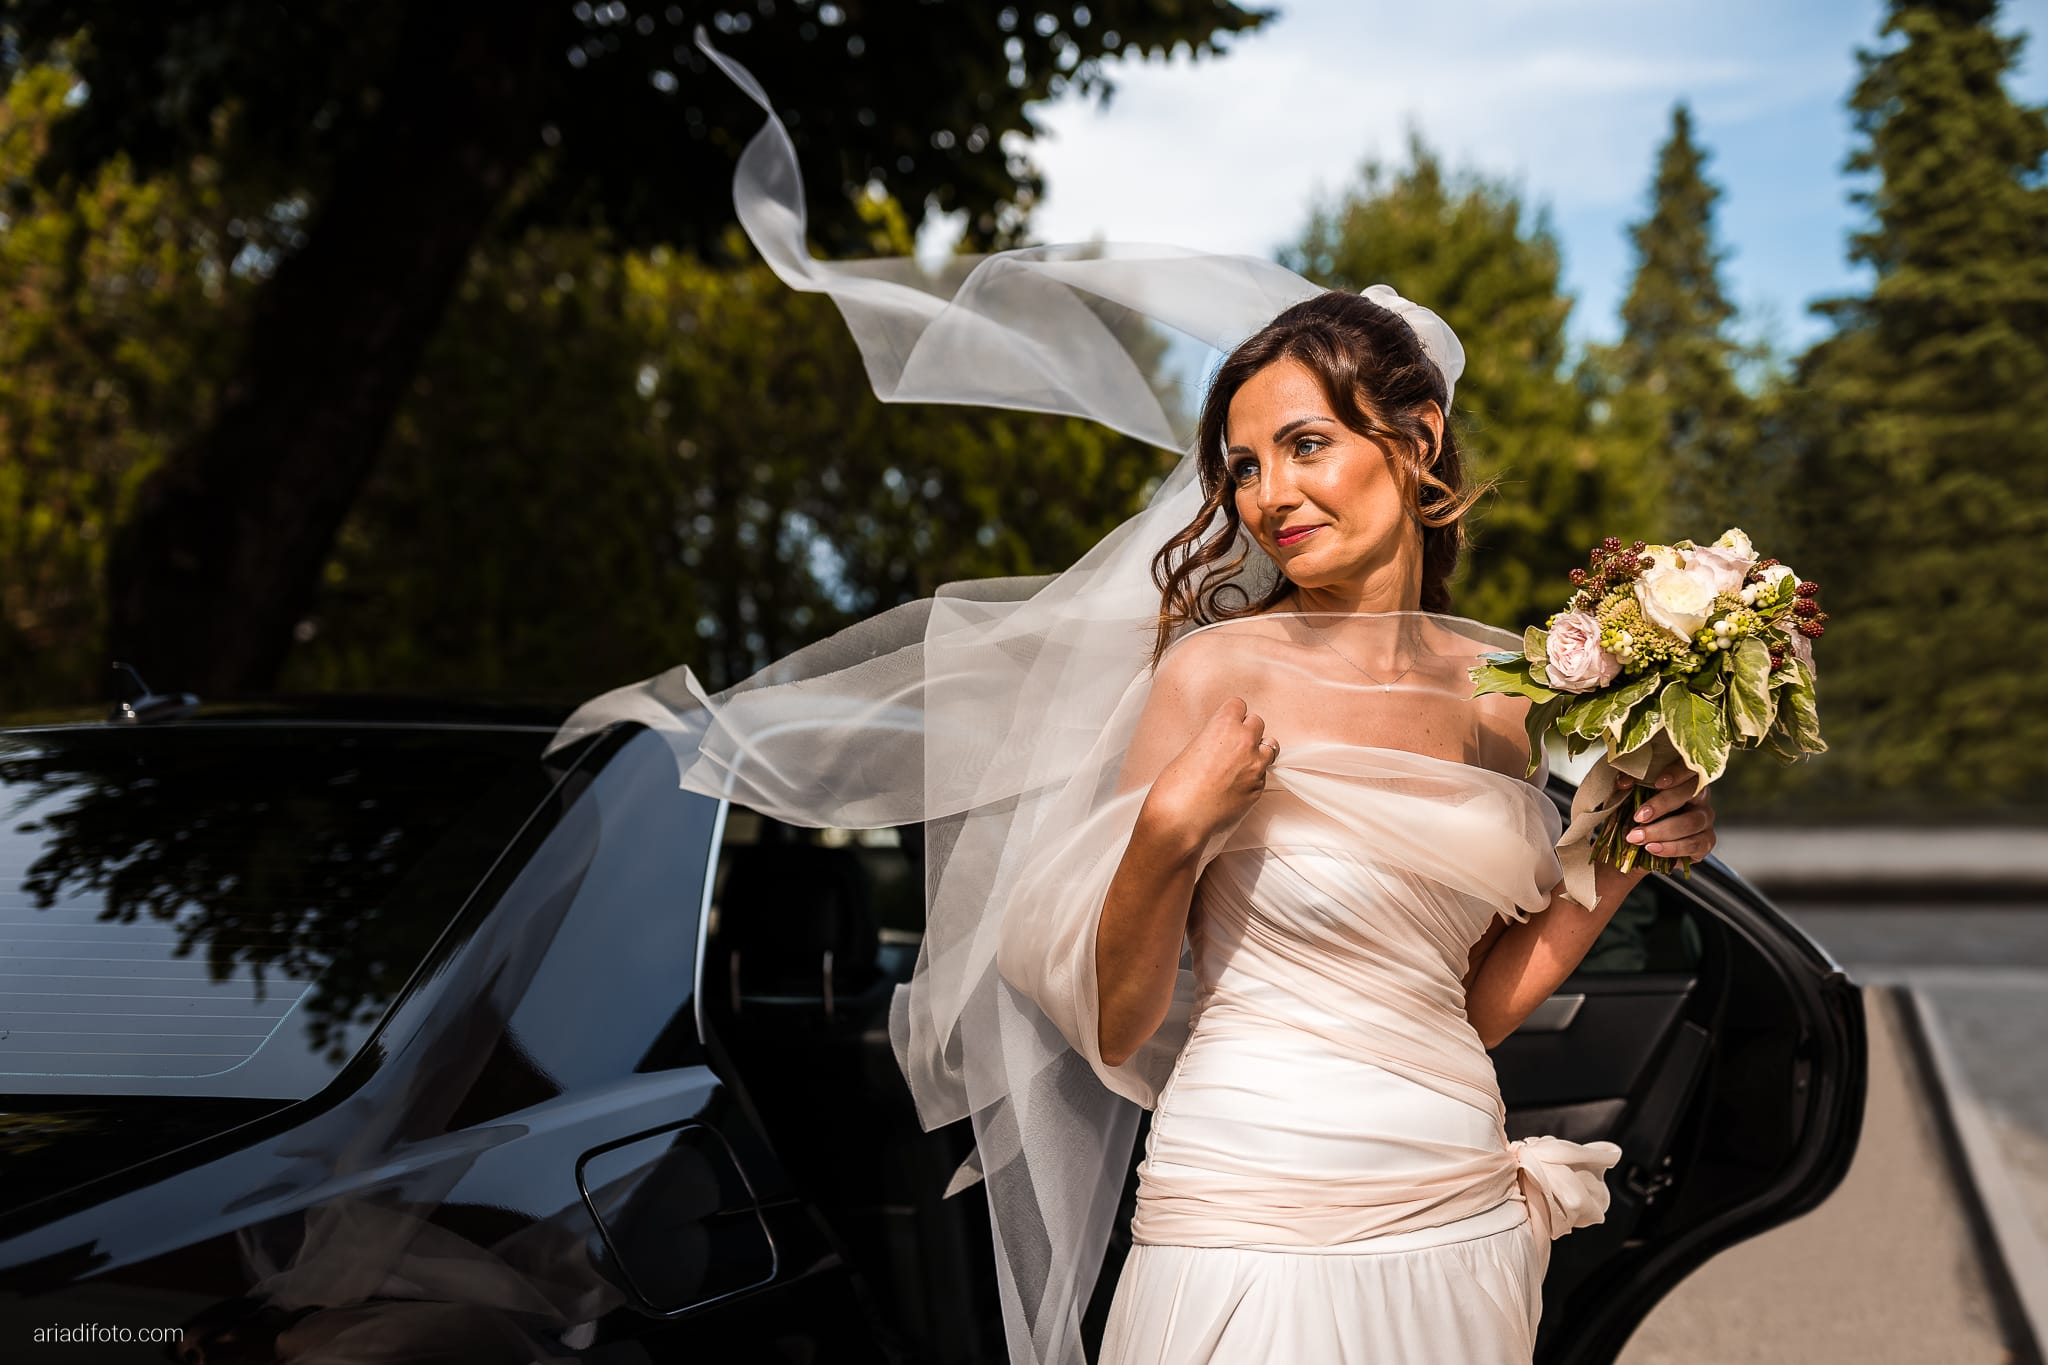 Stefania Raffaele Matrimonio Country Chic Outdoor Gorizia cerimonia ingresso sposa